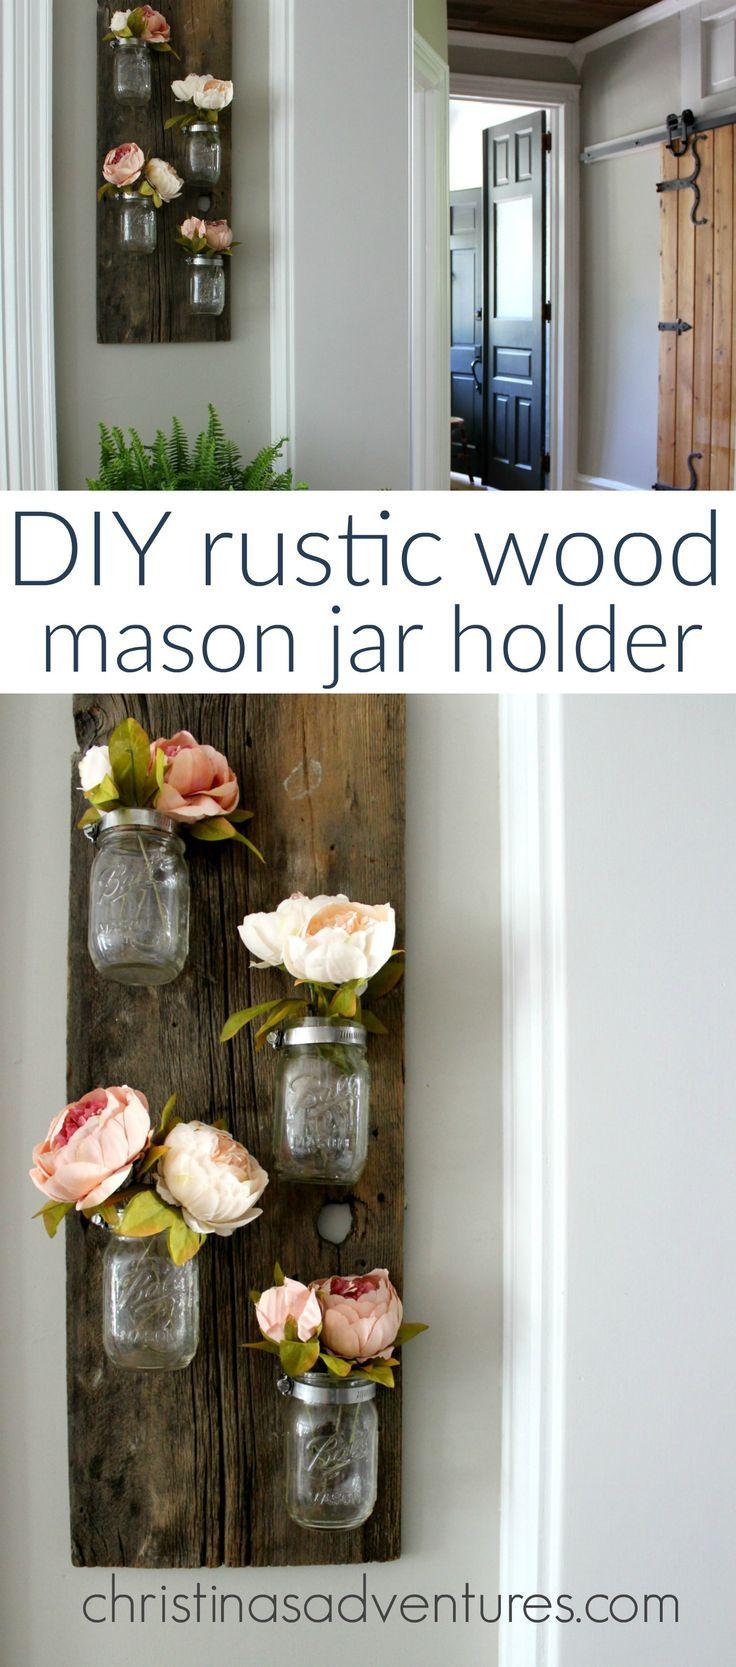 DIY rustic wood mason jar holder – so simple! A great beginners DIY project